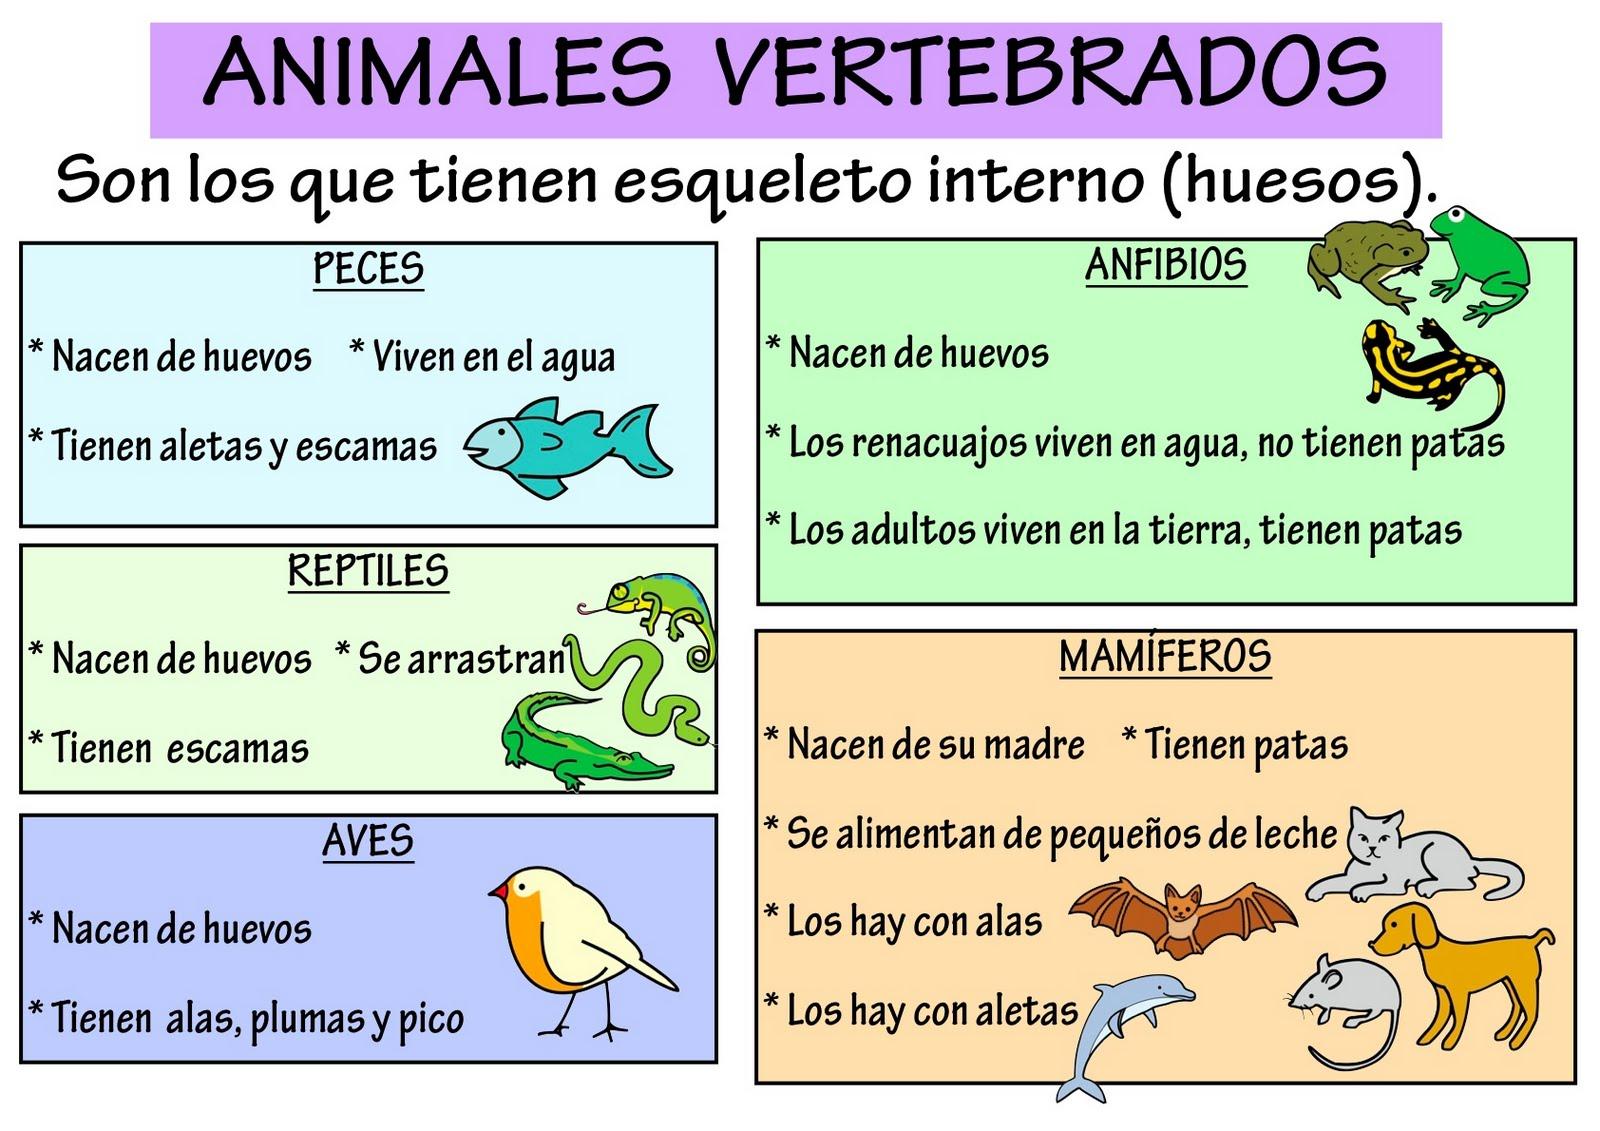 Animales vertebrados: ANIMALES VERTEBRADOS